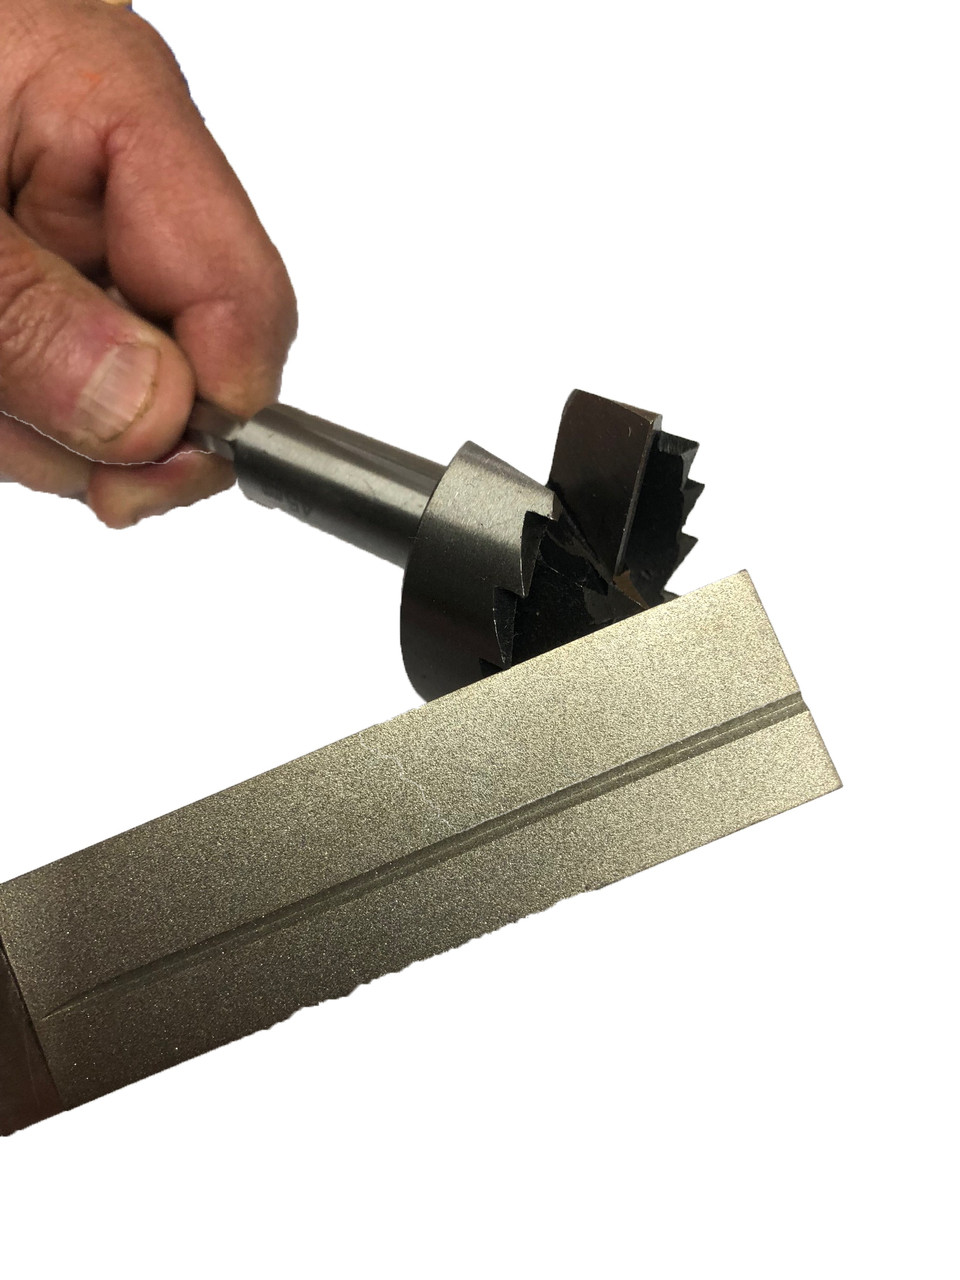 Diamond Sharpener sharpens knives secateures tools and more Superior grade